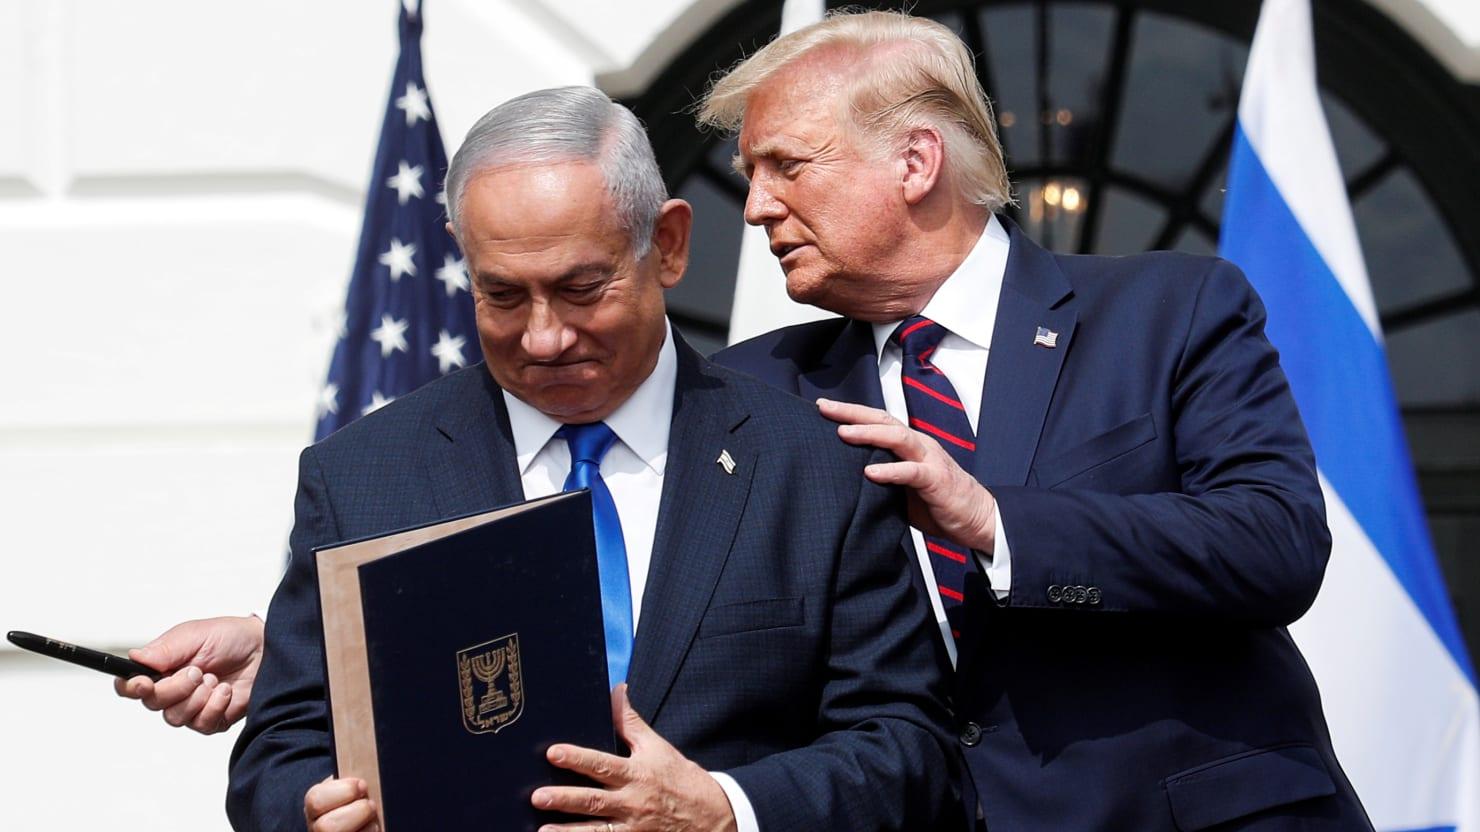 Trump Grants Bibi's Wish for Pardon of Israeli Who Spied on America